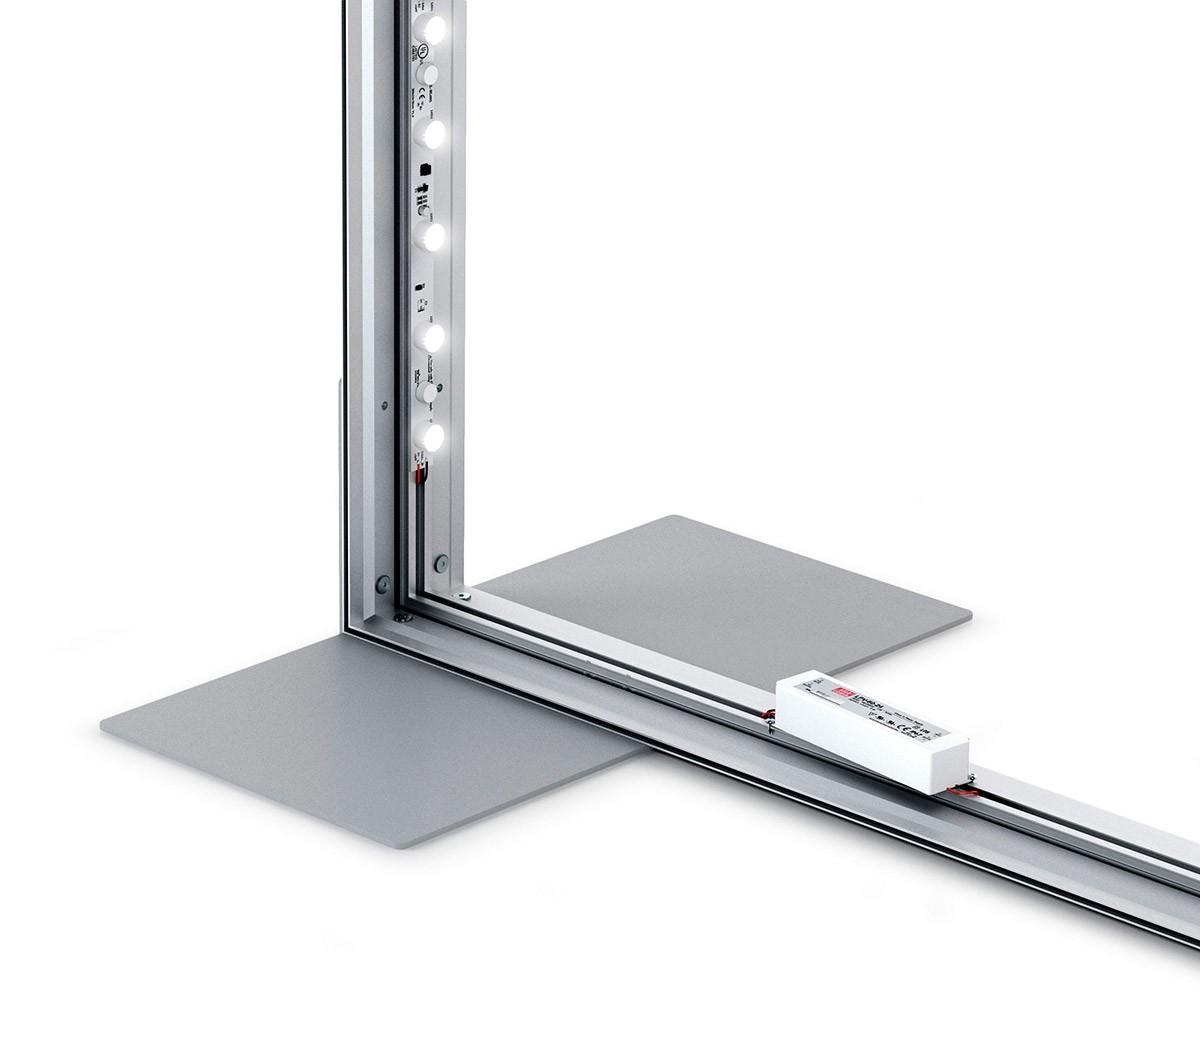 Charisma 96x90 Single Sided LED SEG Fabric Light Box